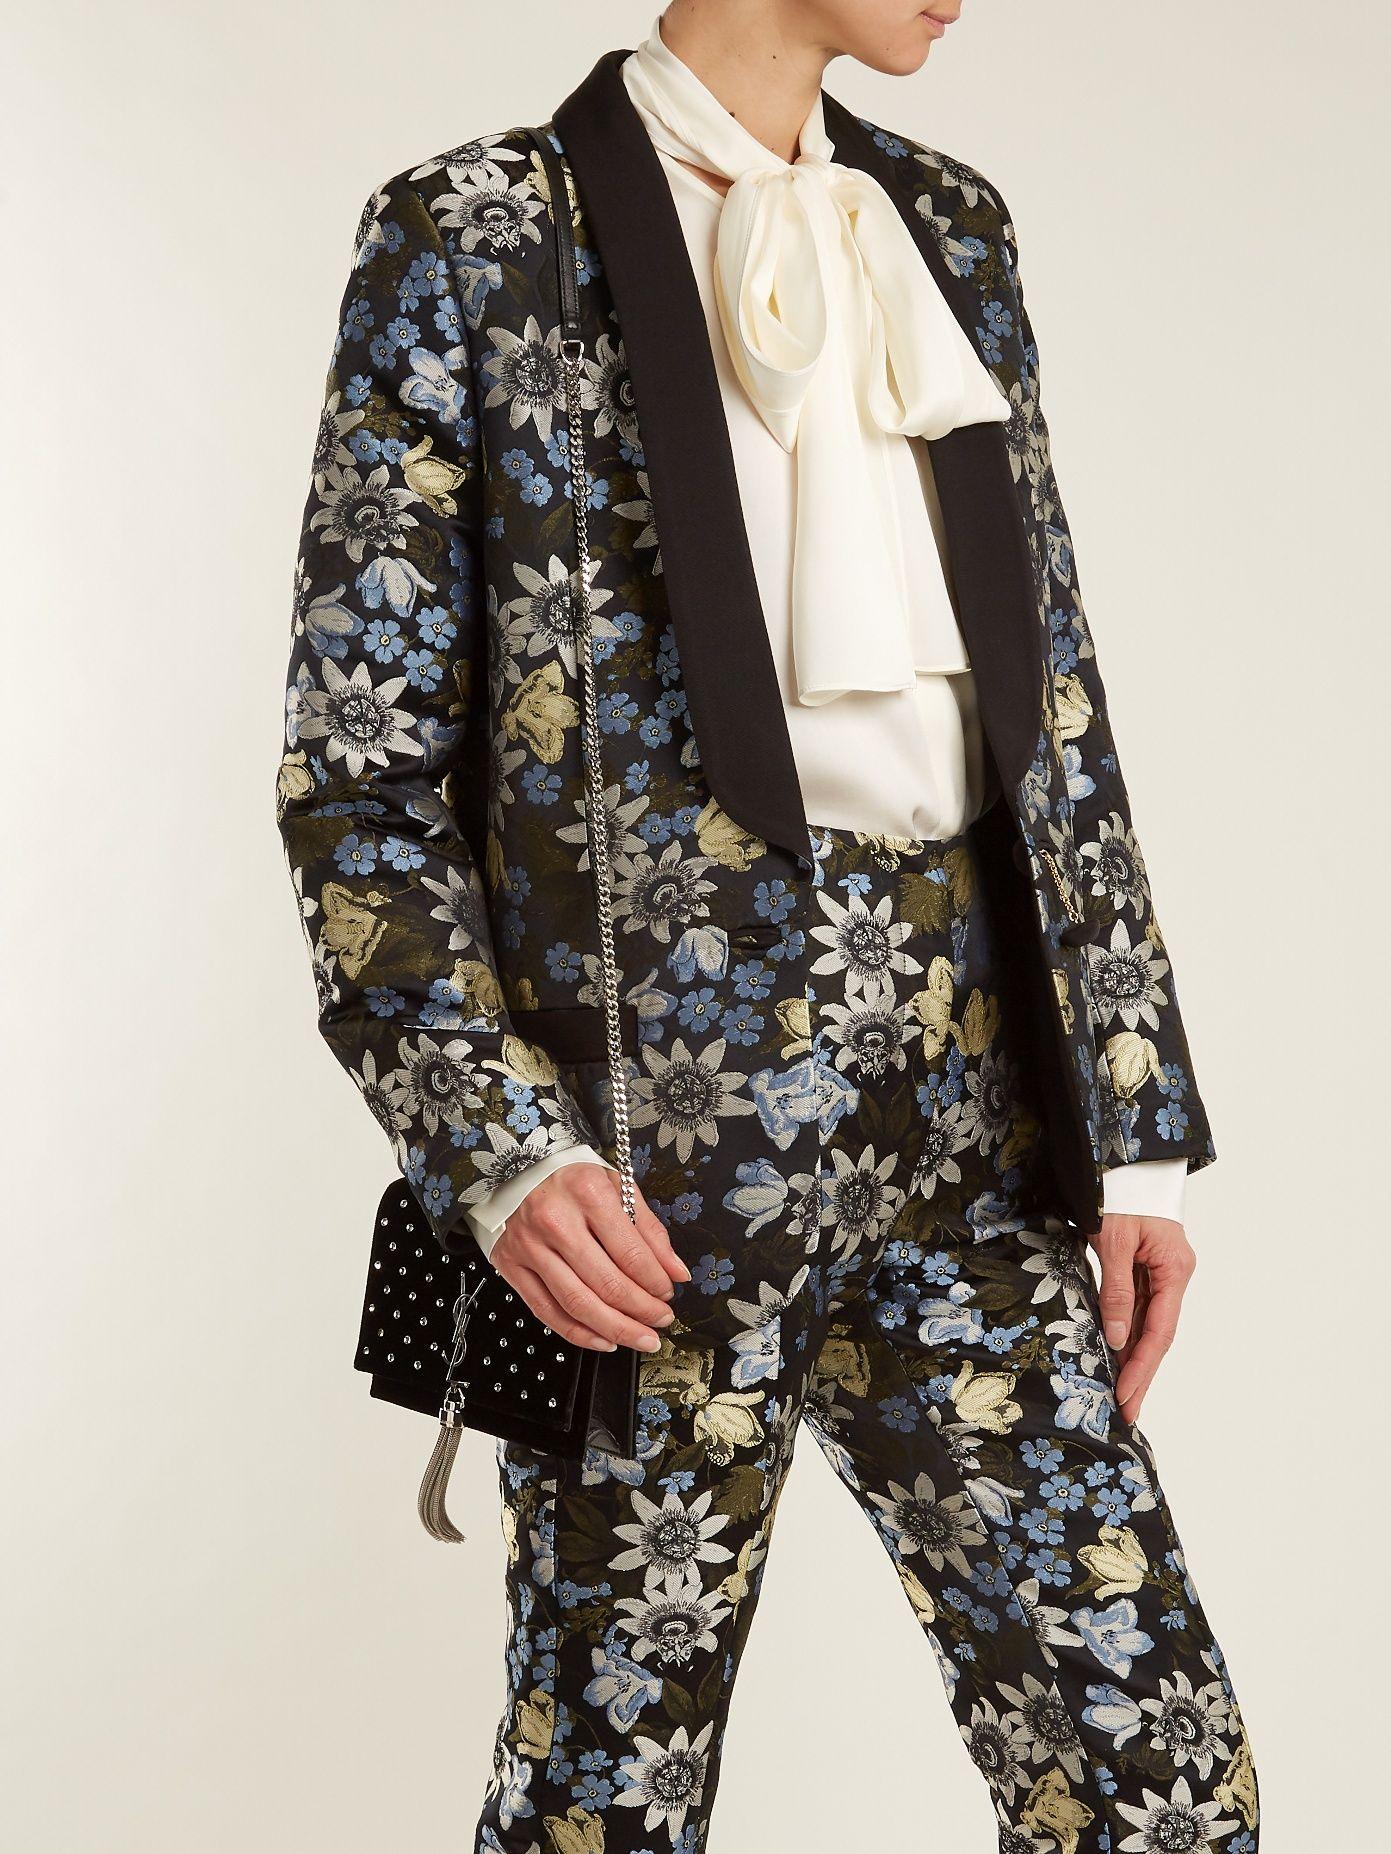 Click here to buy Erdem Anisha floral-jacquard jacket at MATCHESFASHION.COM